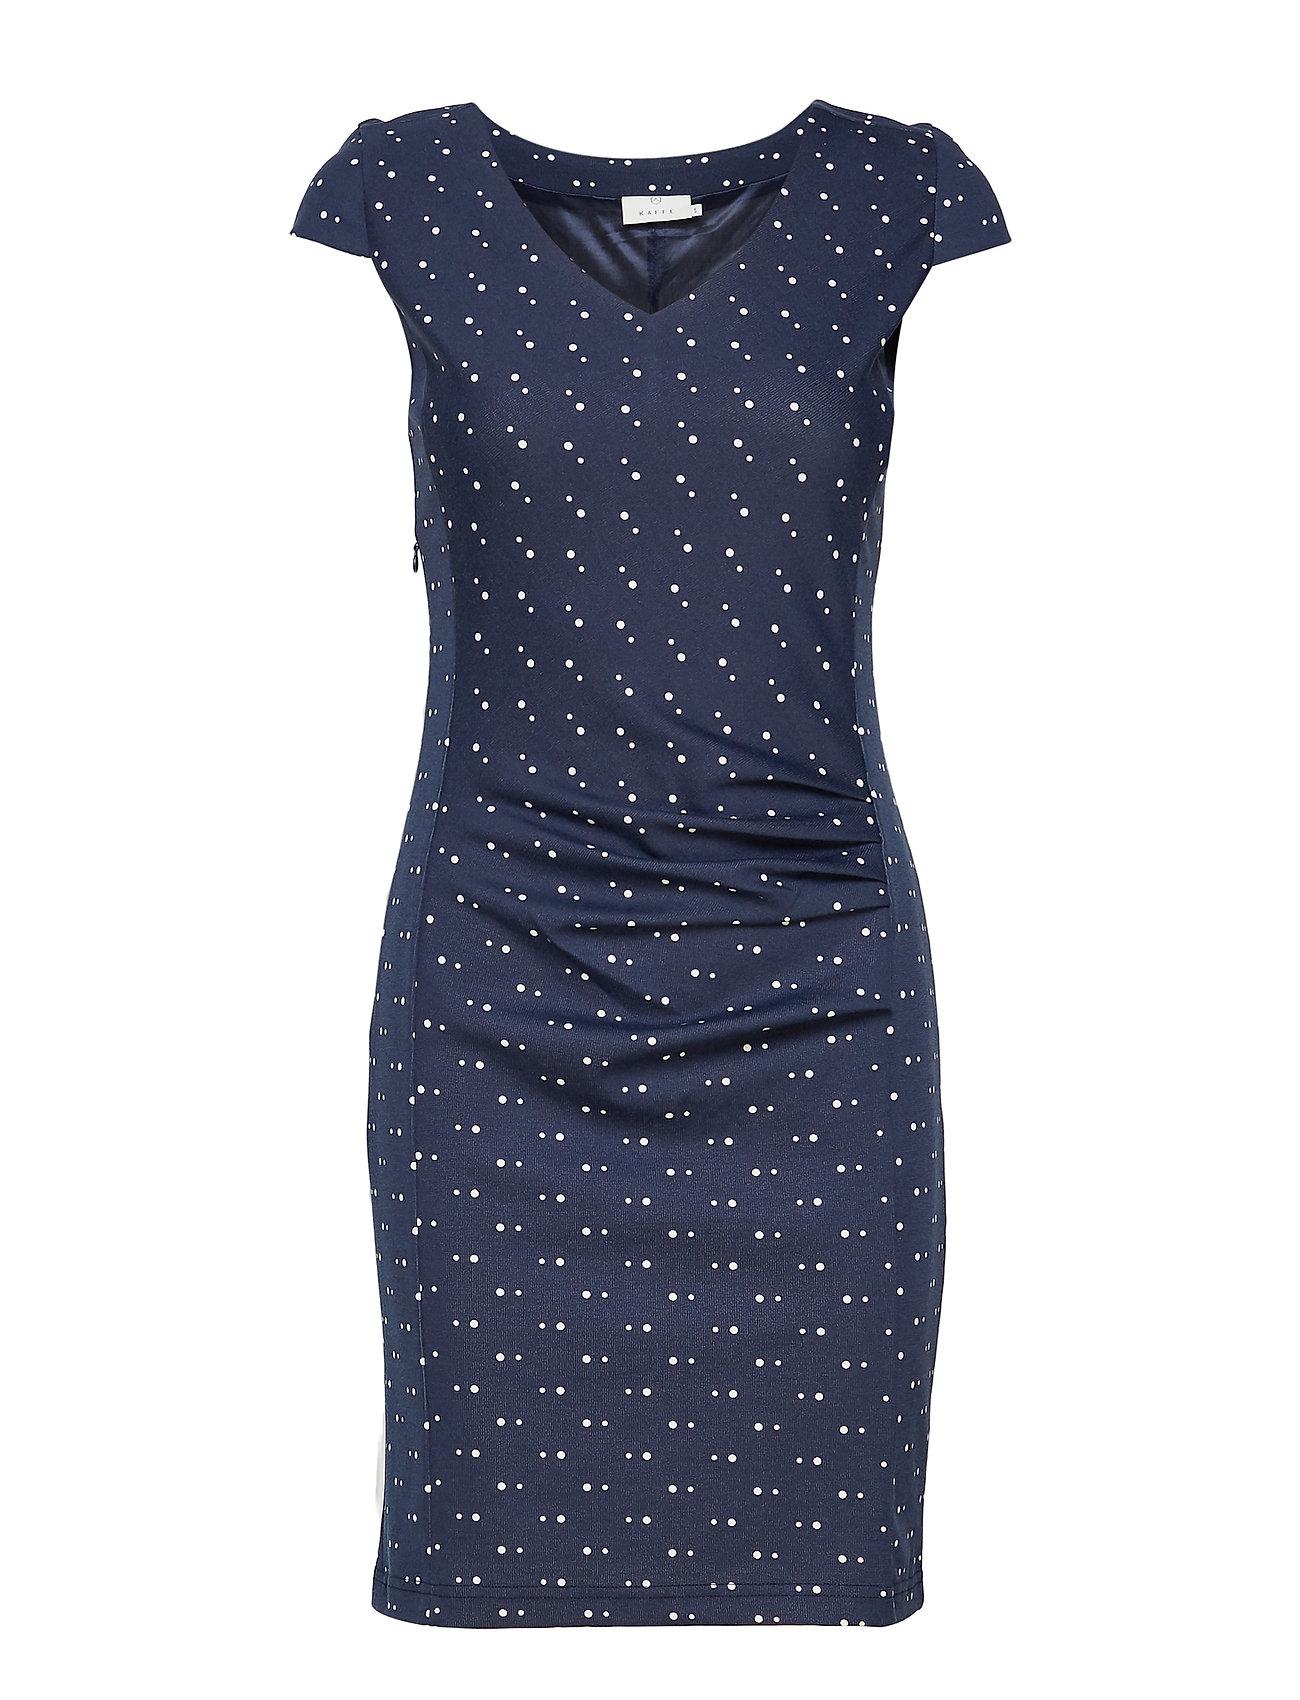 Kaffe Abel India Dress - MIDNIGHT MARINE/50003